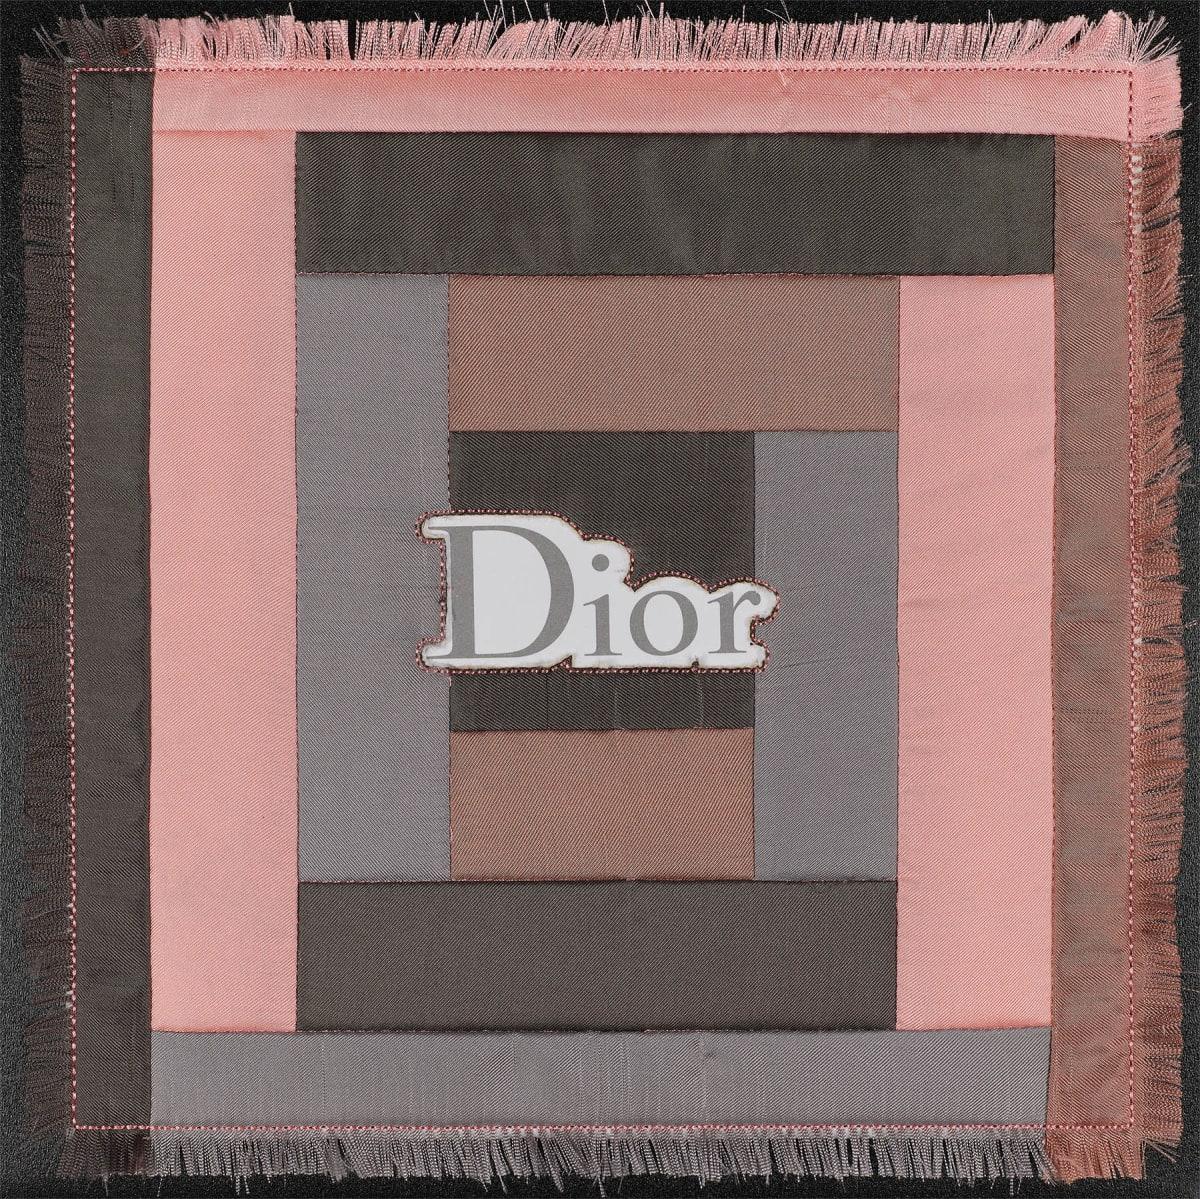 Stephen Wilson, Dior Quilt Square, 2019